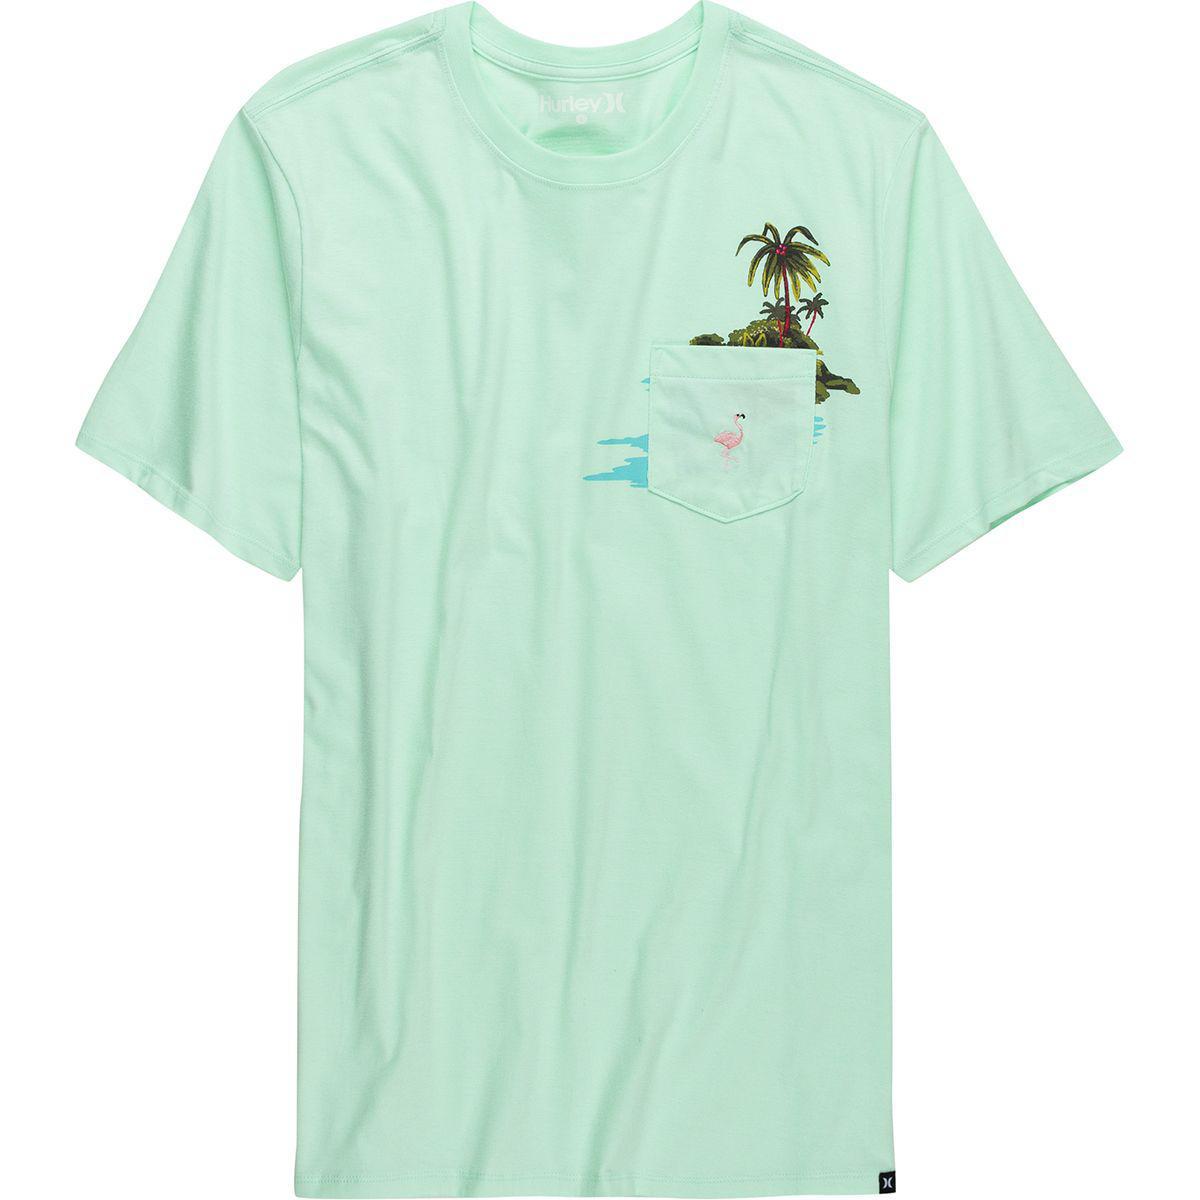 b91c1e9bc9b1d0 Lyst - Hurley Premium Flamingo Pocket Short-sleeve T-shirt in Blue ...